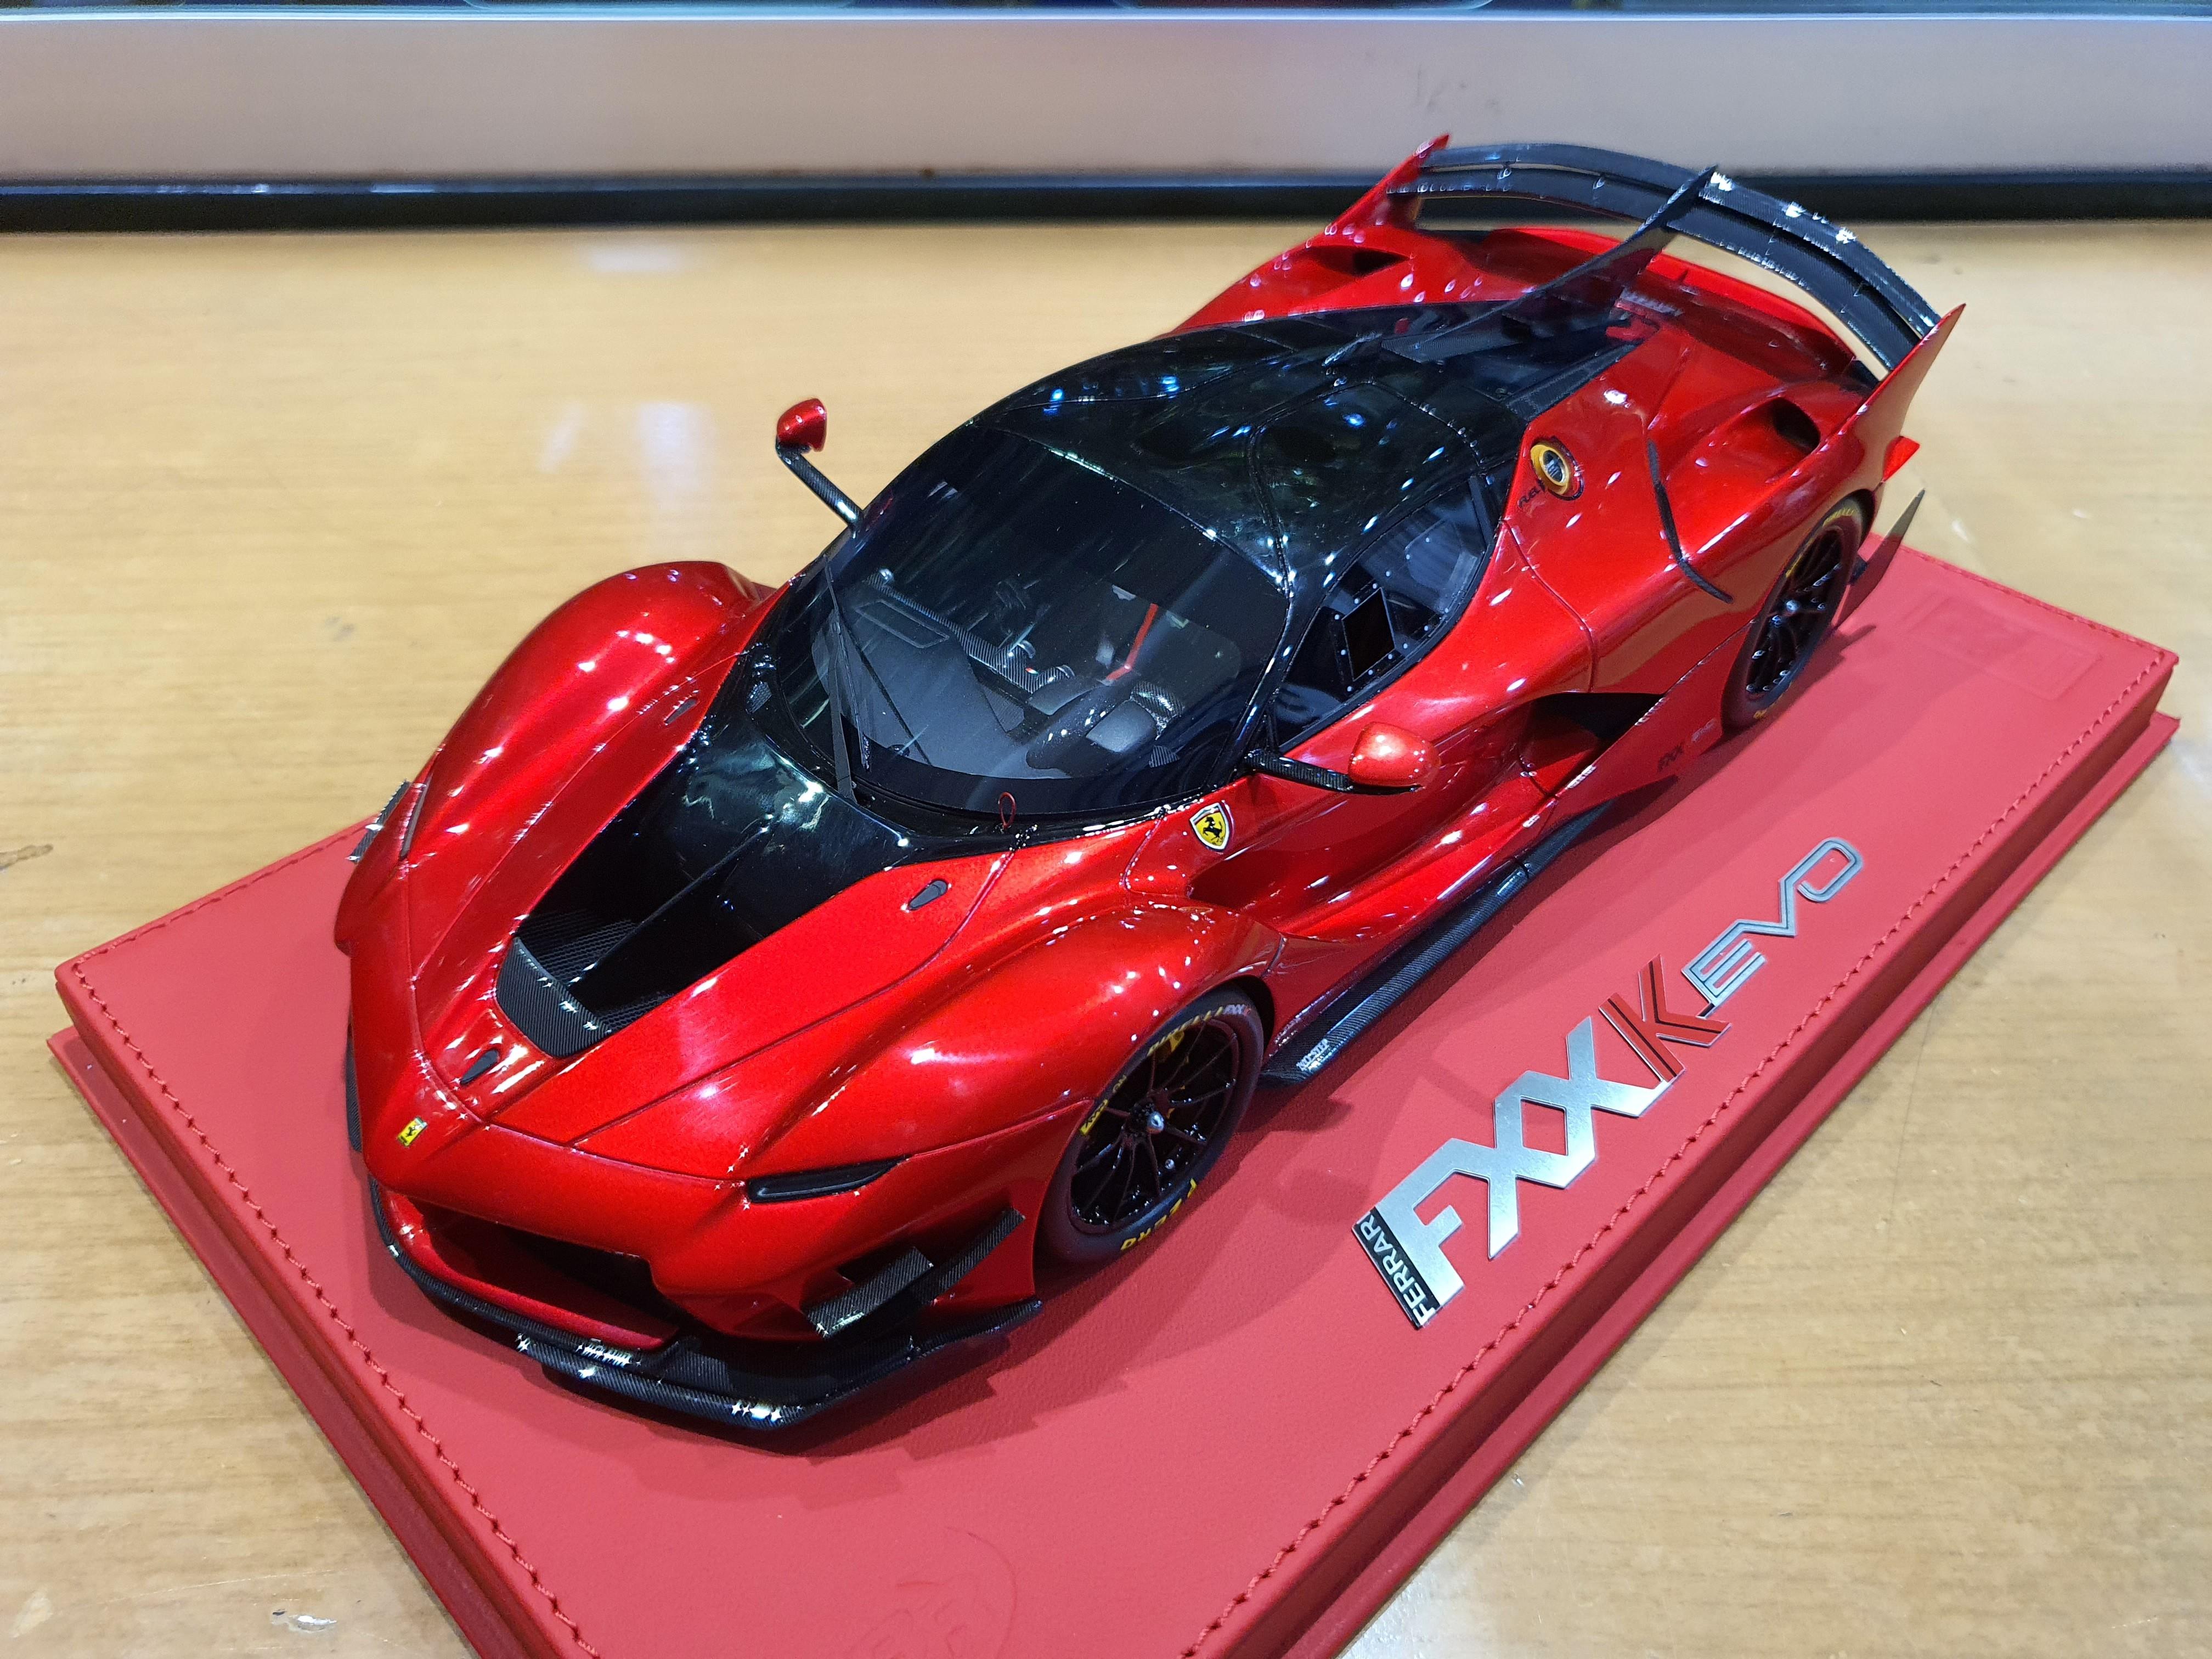 Bbr Ferrari Fxxk Evo Ferrari Diecastxchange Com Diecast Cars Forums